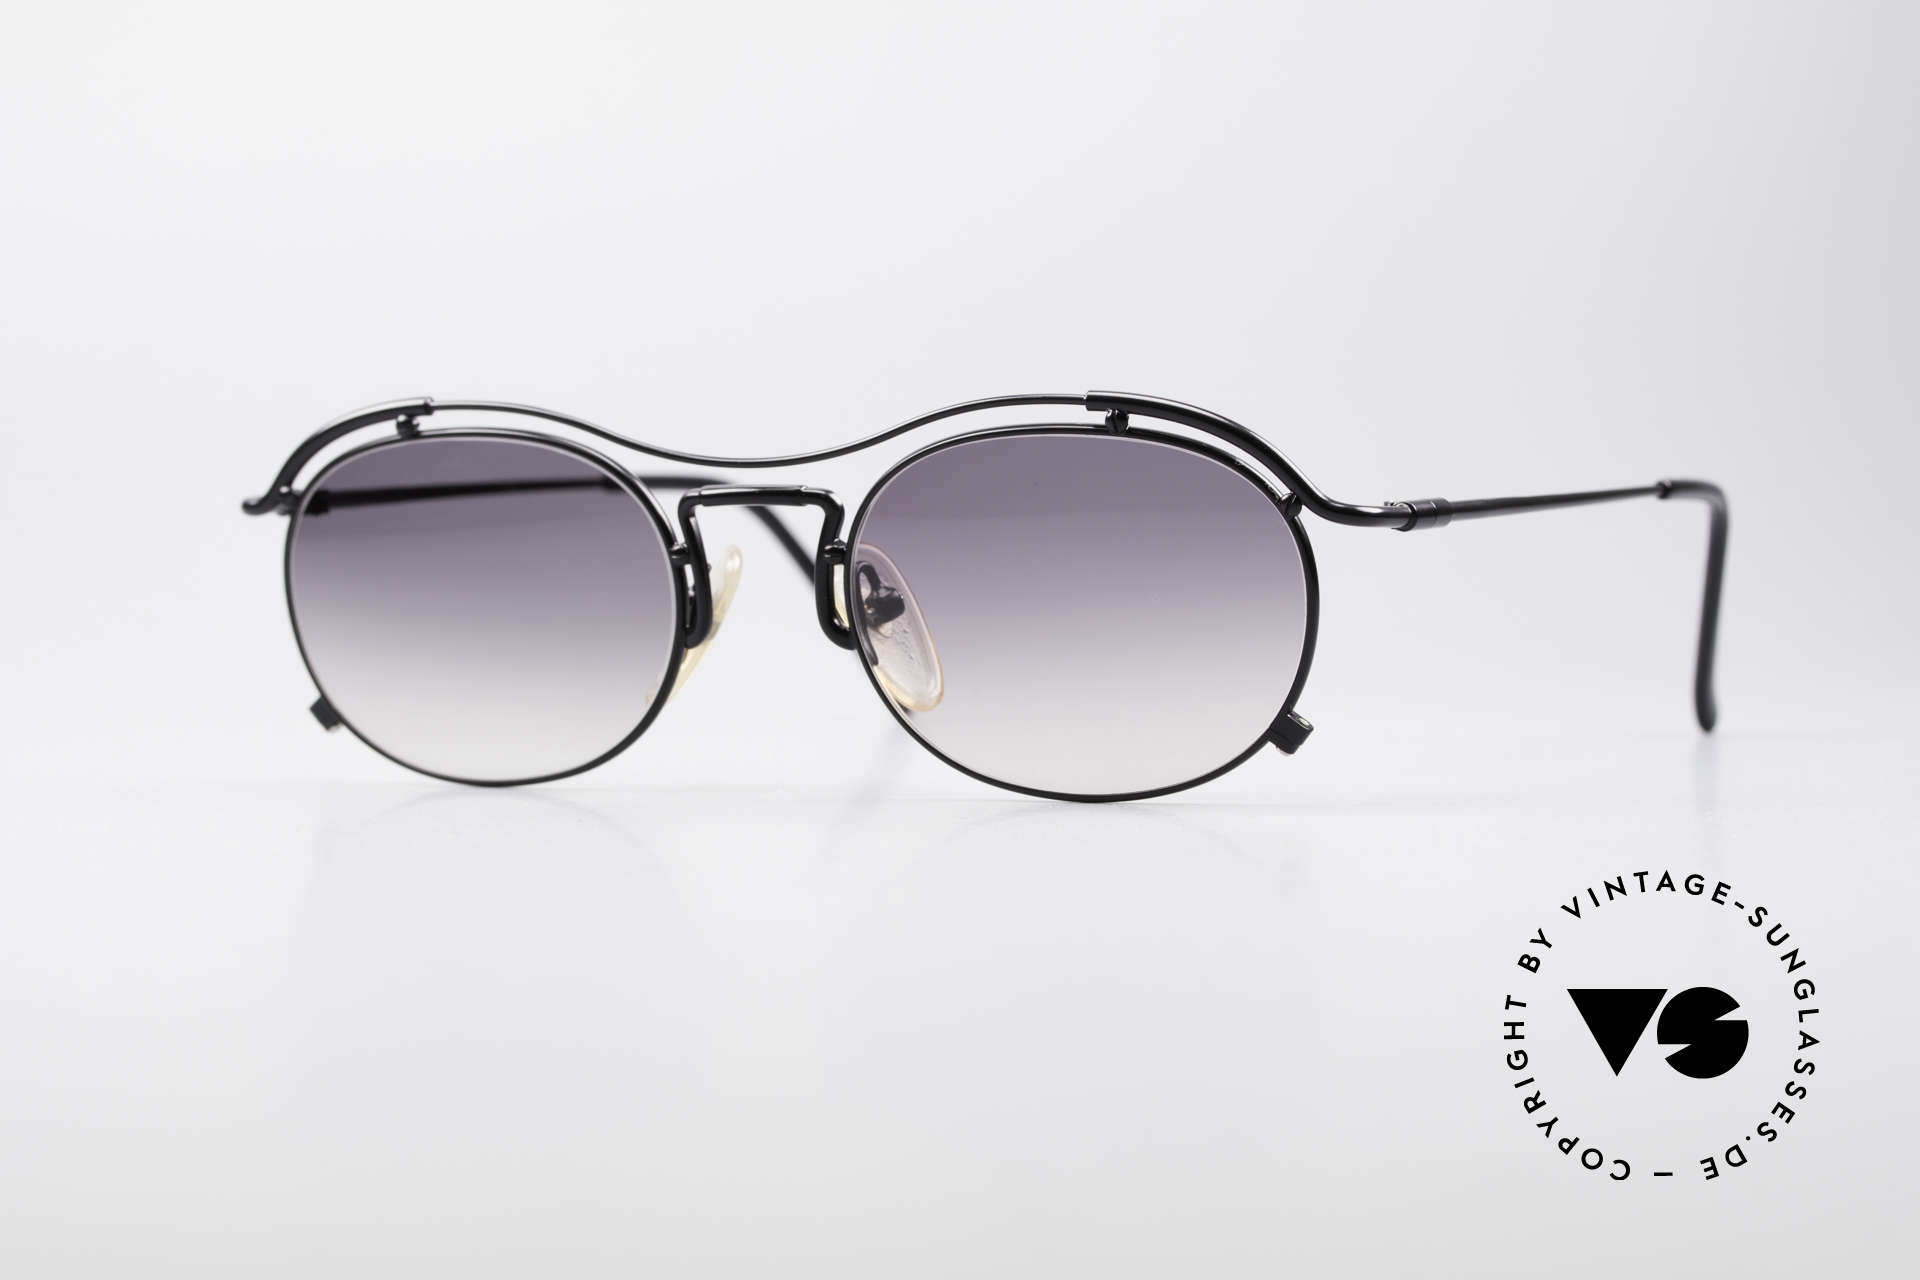 Jean Paul Gaultier 55-2170 Vintage JPG Sunglasses, true vintage Jean Paul GAULTIER designer shades, Made for Men and Women